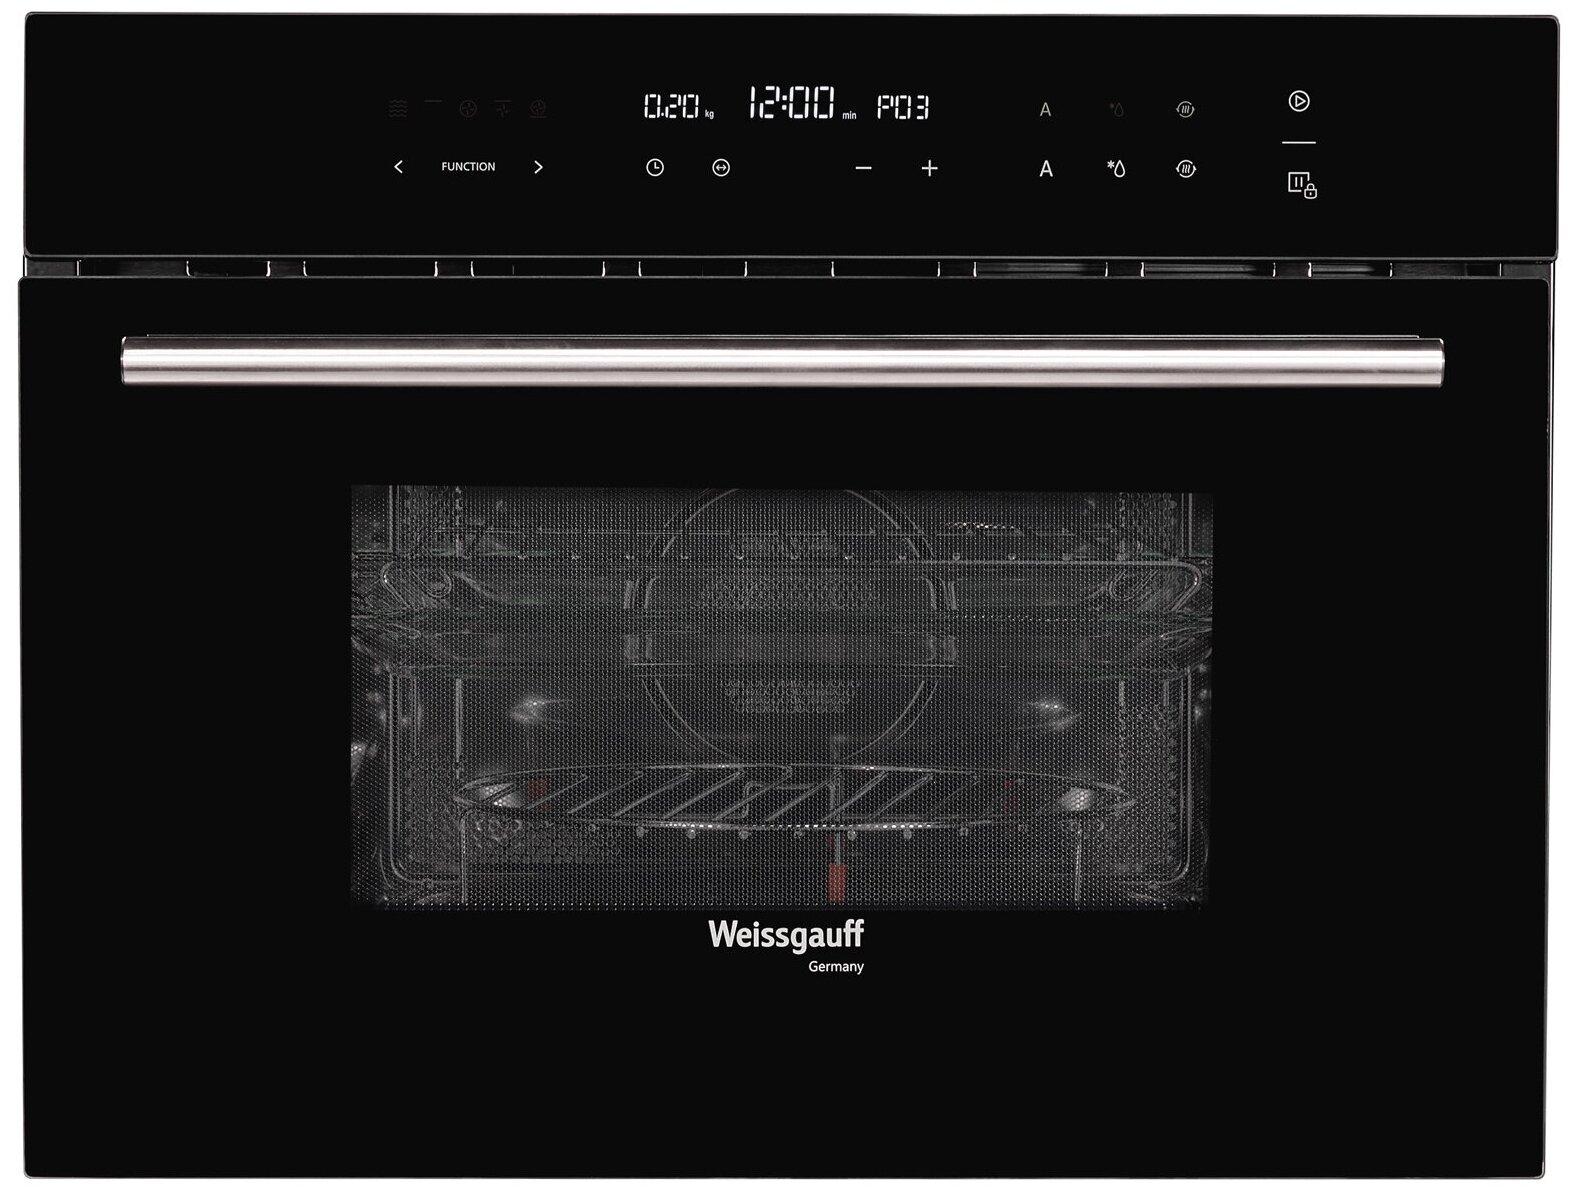 Weissgauff OE 446 B - установка: независимая